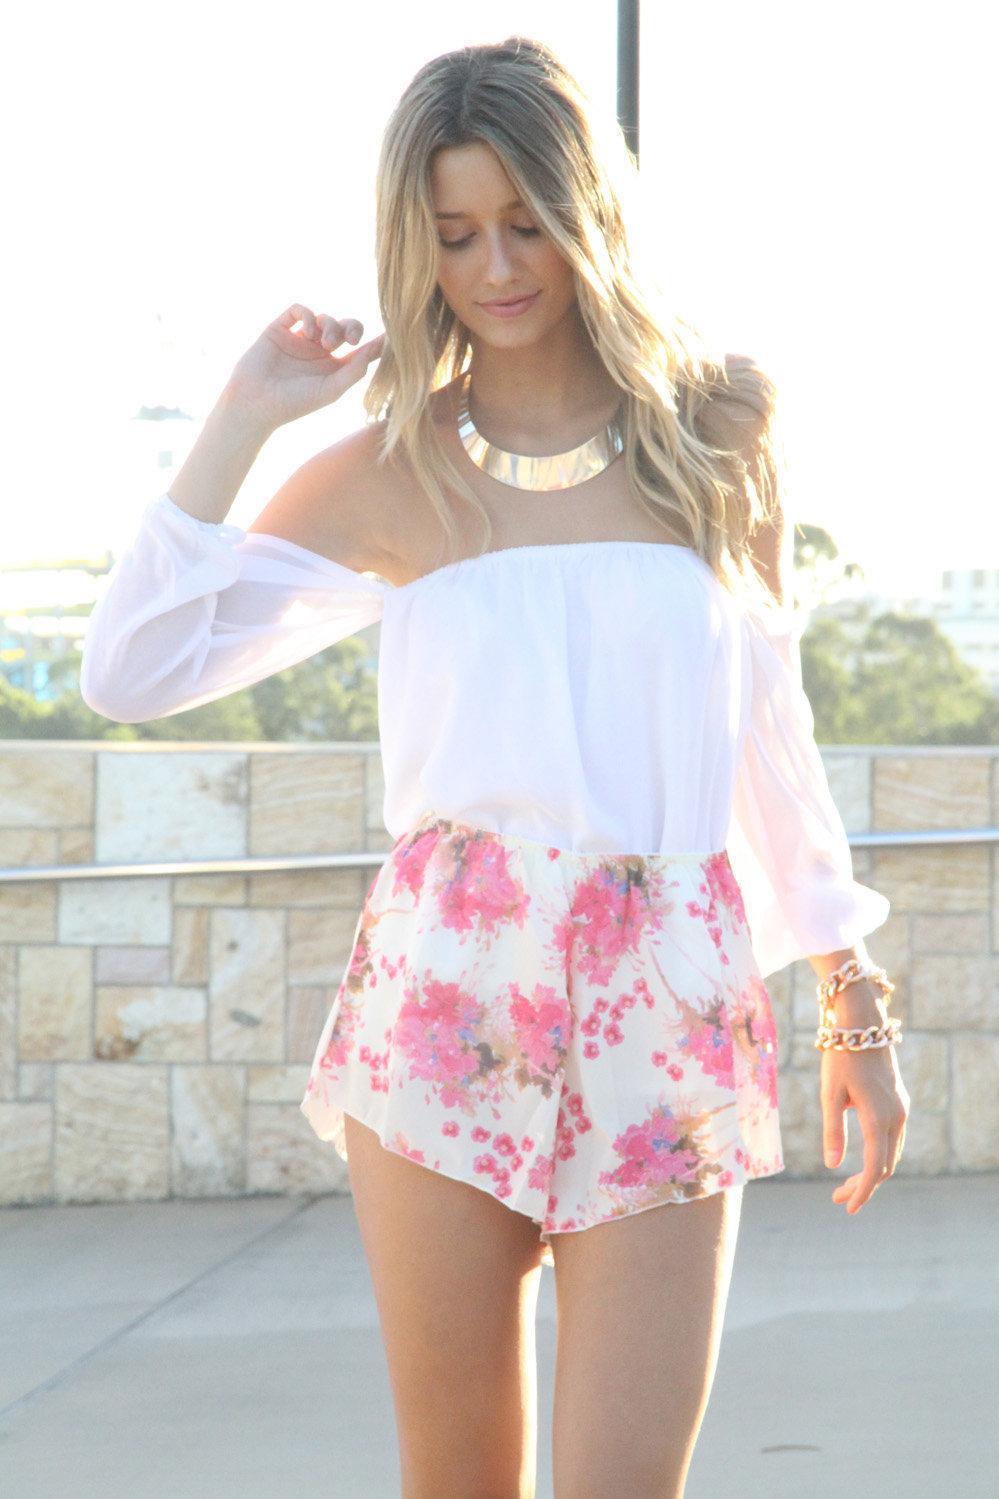 #saboskirt.com            #Skirt                    #SABO #SKIRT #Floral #Bloomer #Shorts               SABO SKIRT Floral Bloomer Shorts                                              http://www.seapai.com/product.aspx?PID=1051395